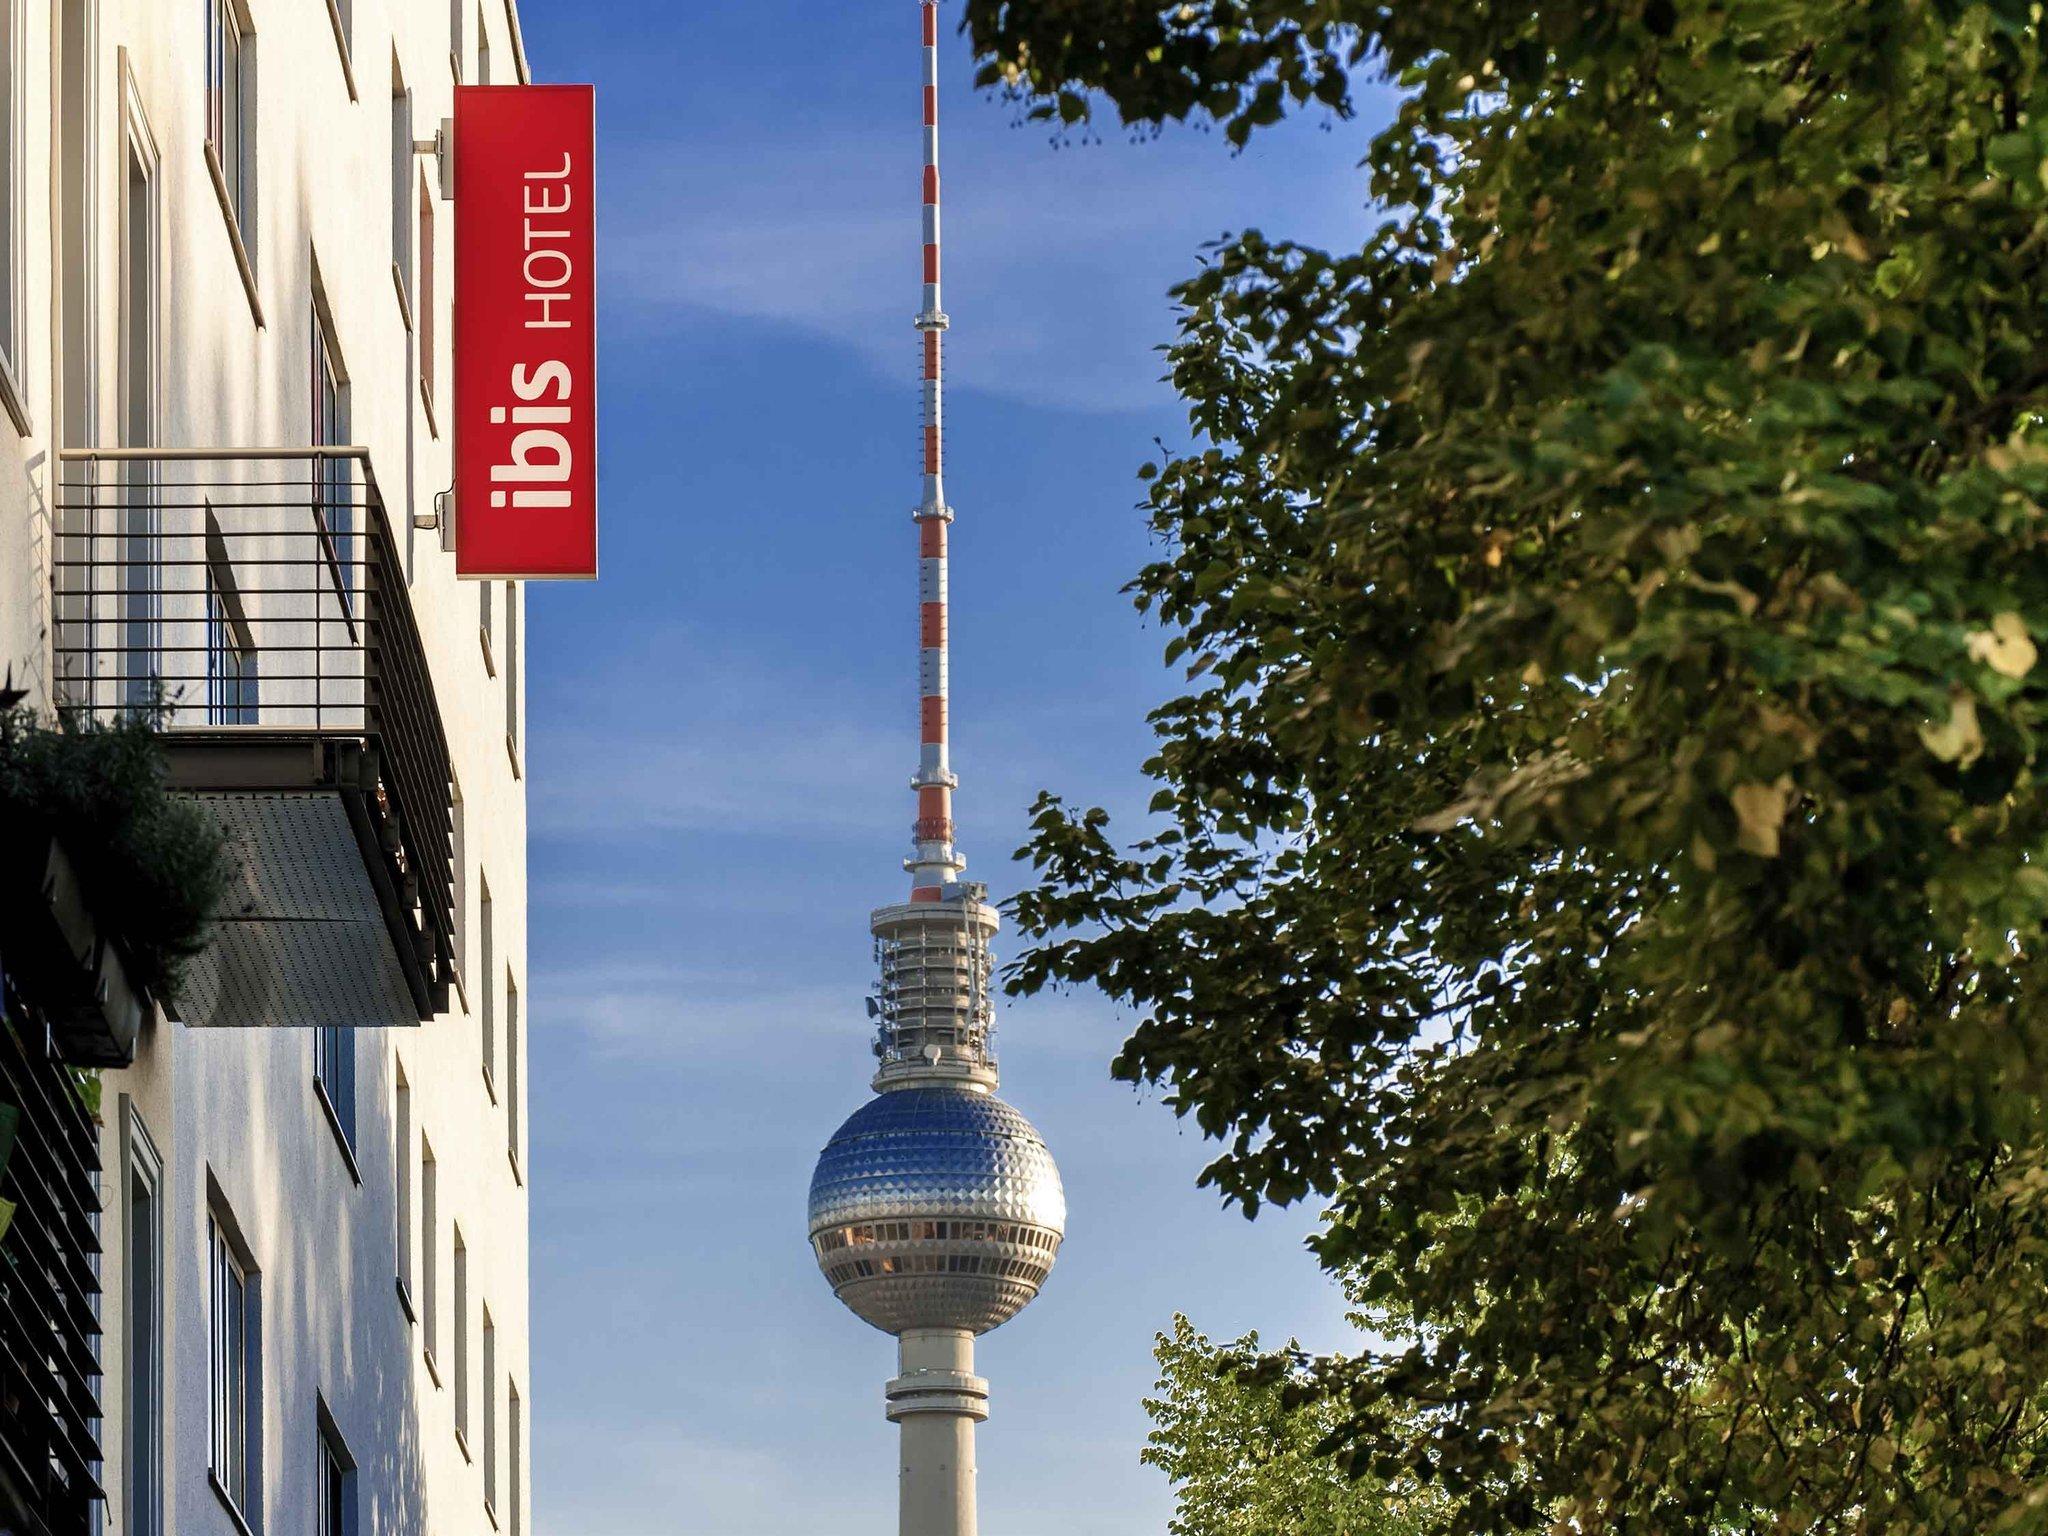 Hotel Berlin Top Hotels In Berlin Gunstig Bei Hrs Buchen